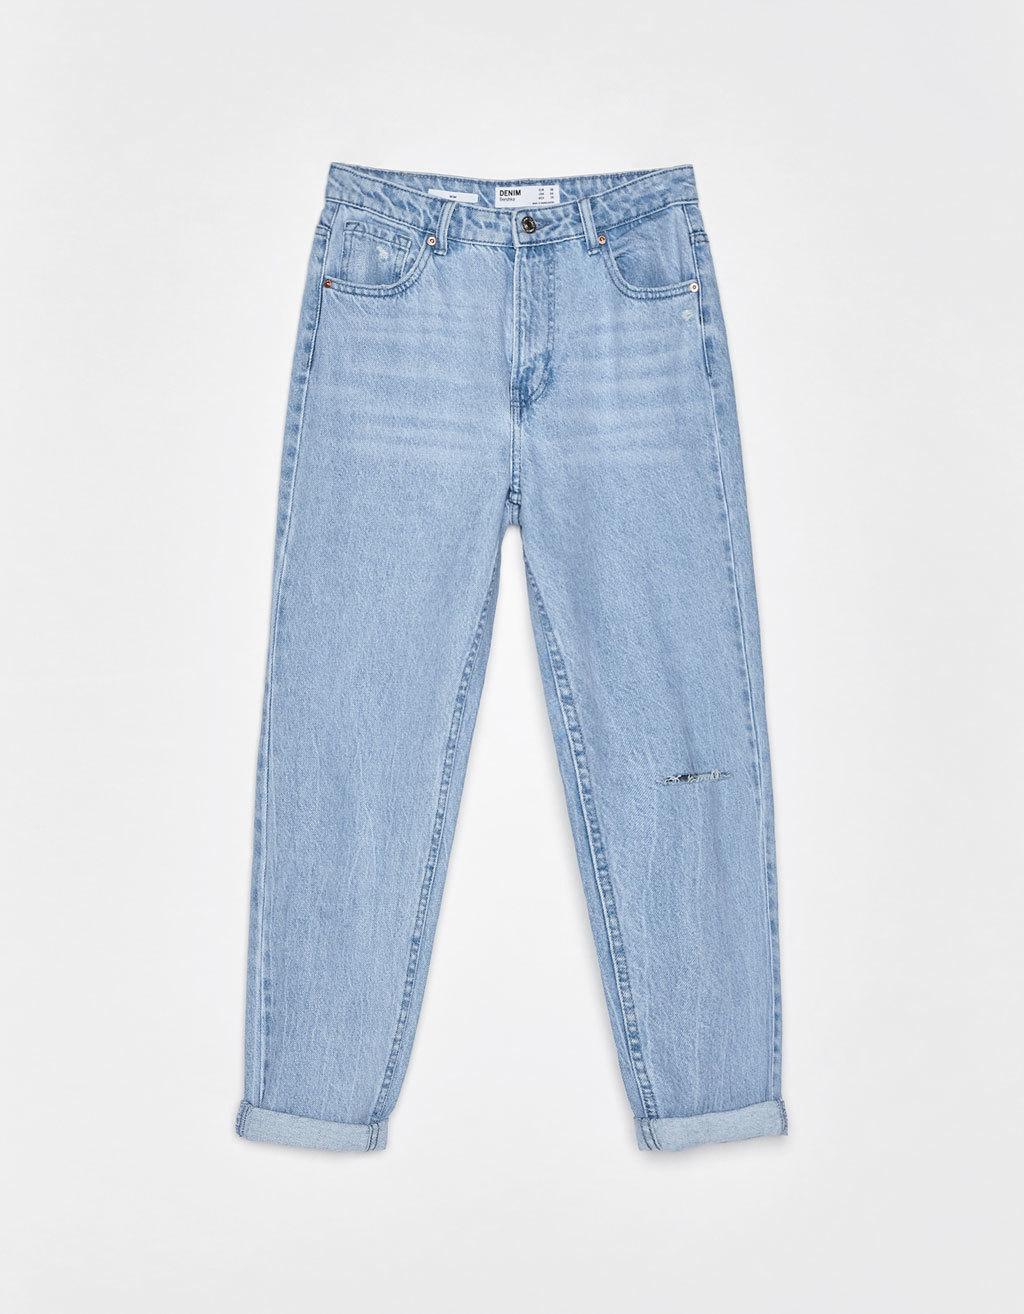 Pantalones vaqueros rectos tipo mom jeans, de Bershka (19,99 euros).